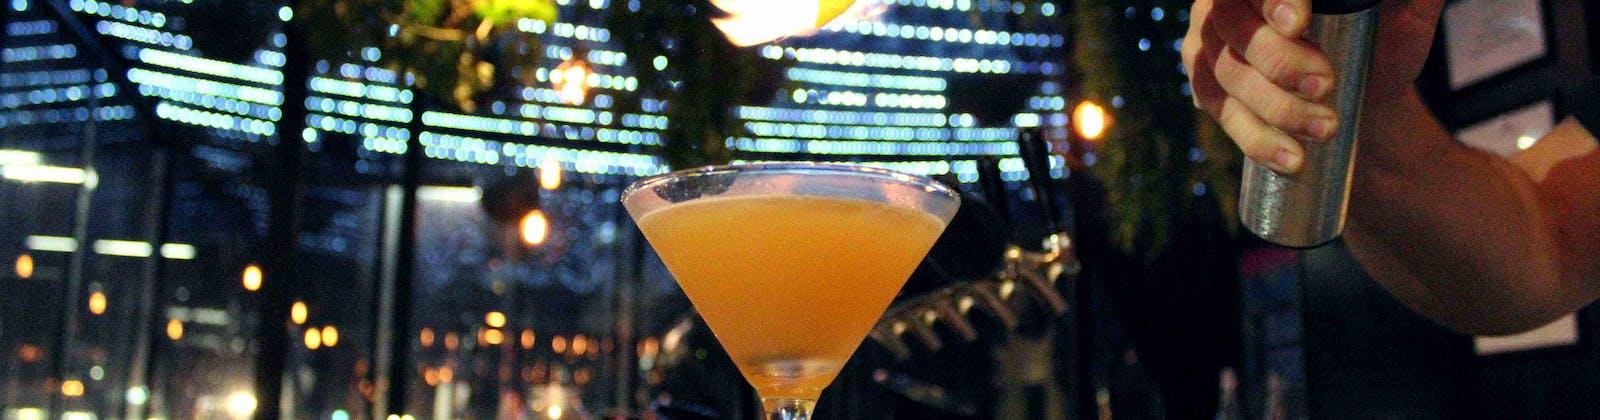 bartender toasting orange peel for a margarita